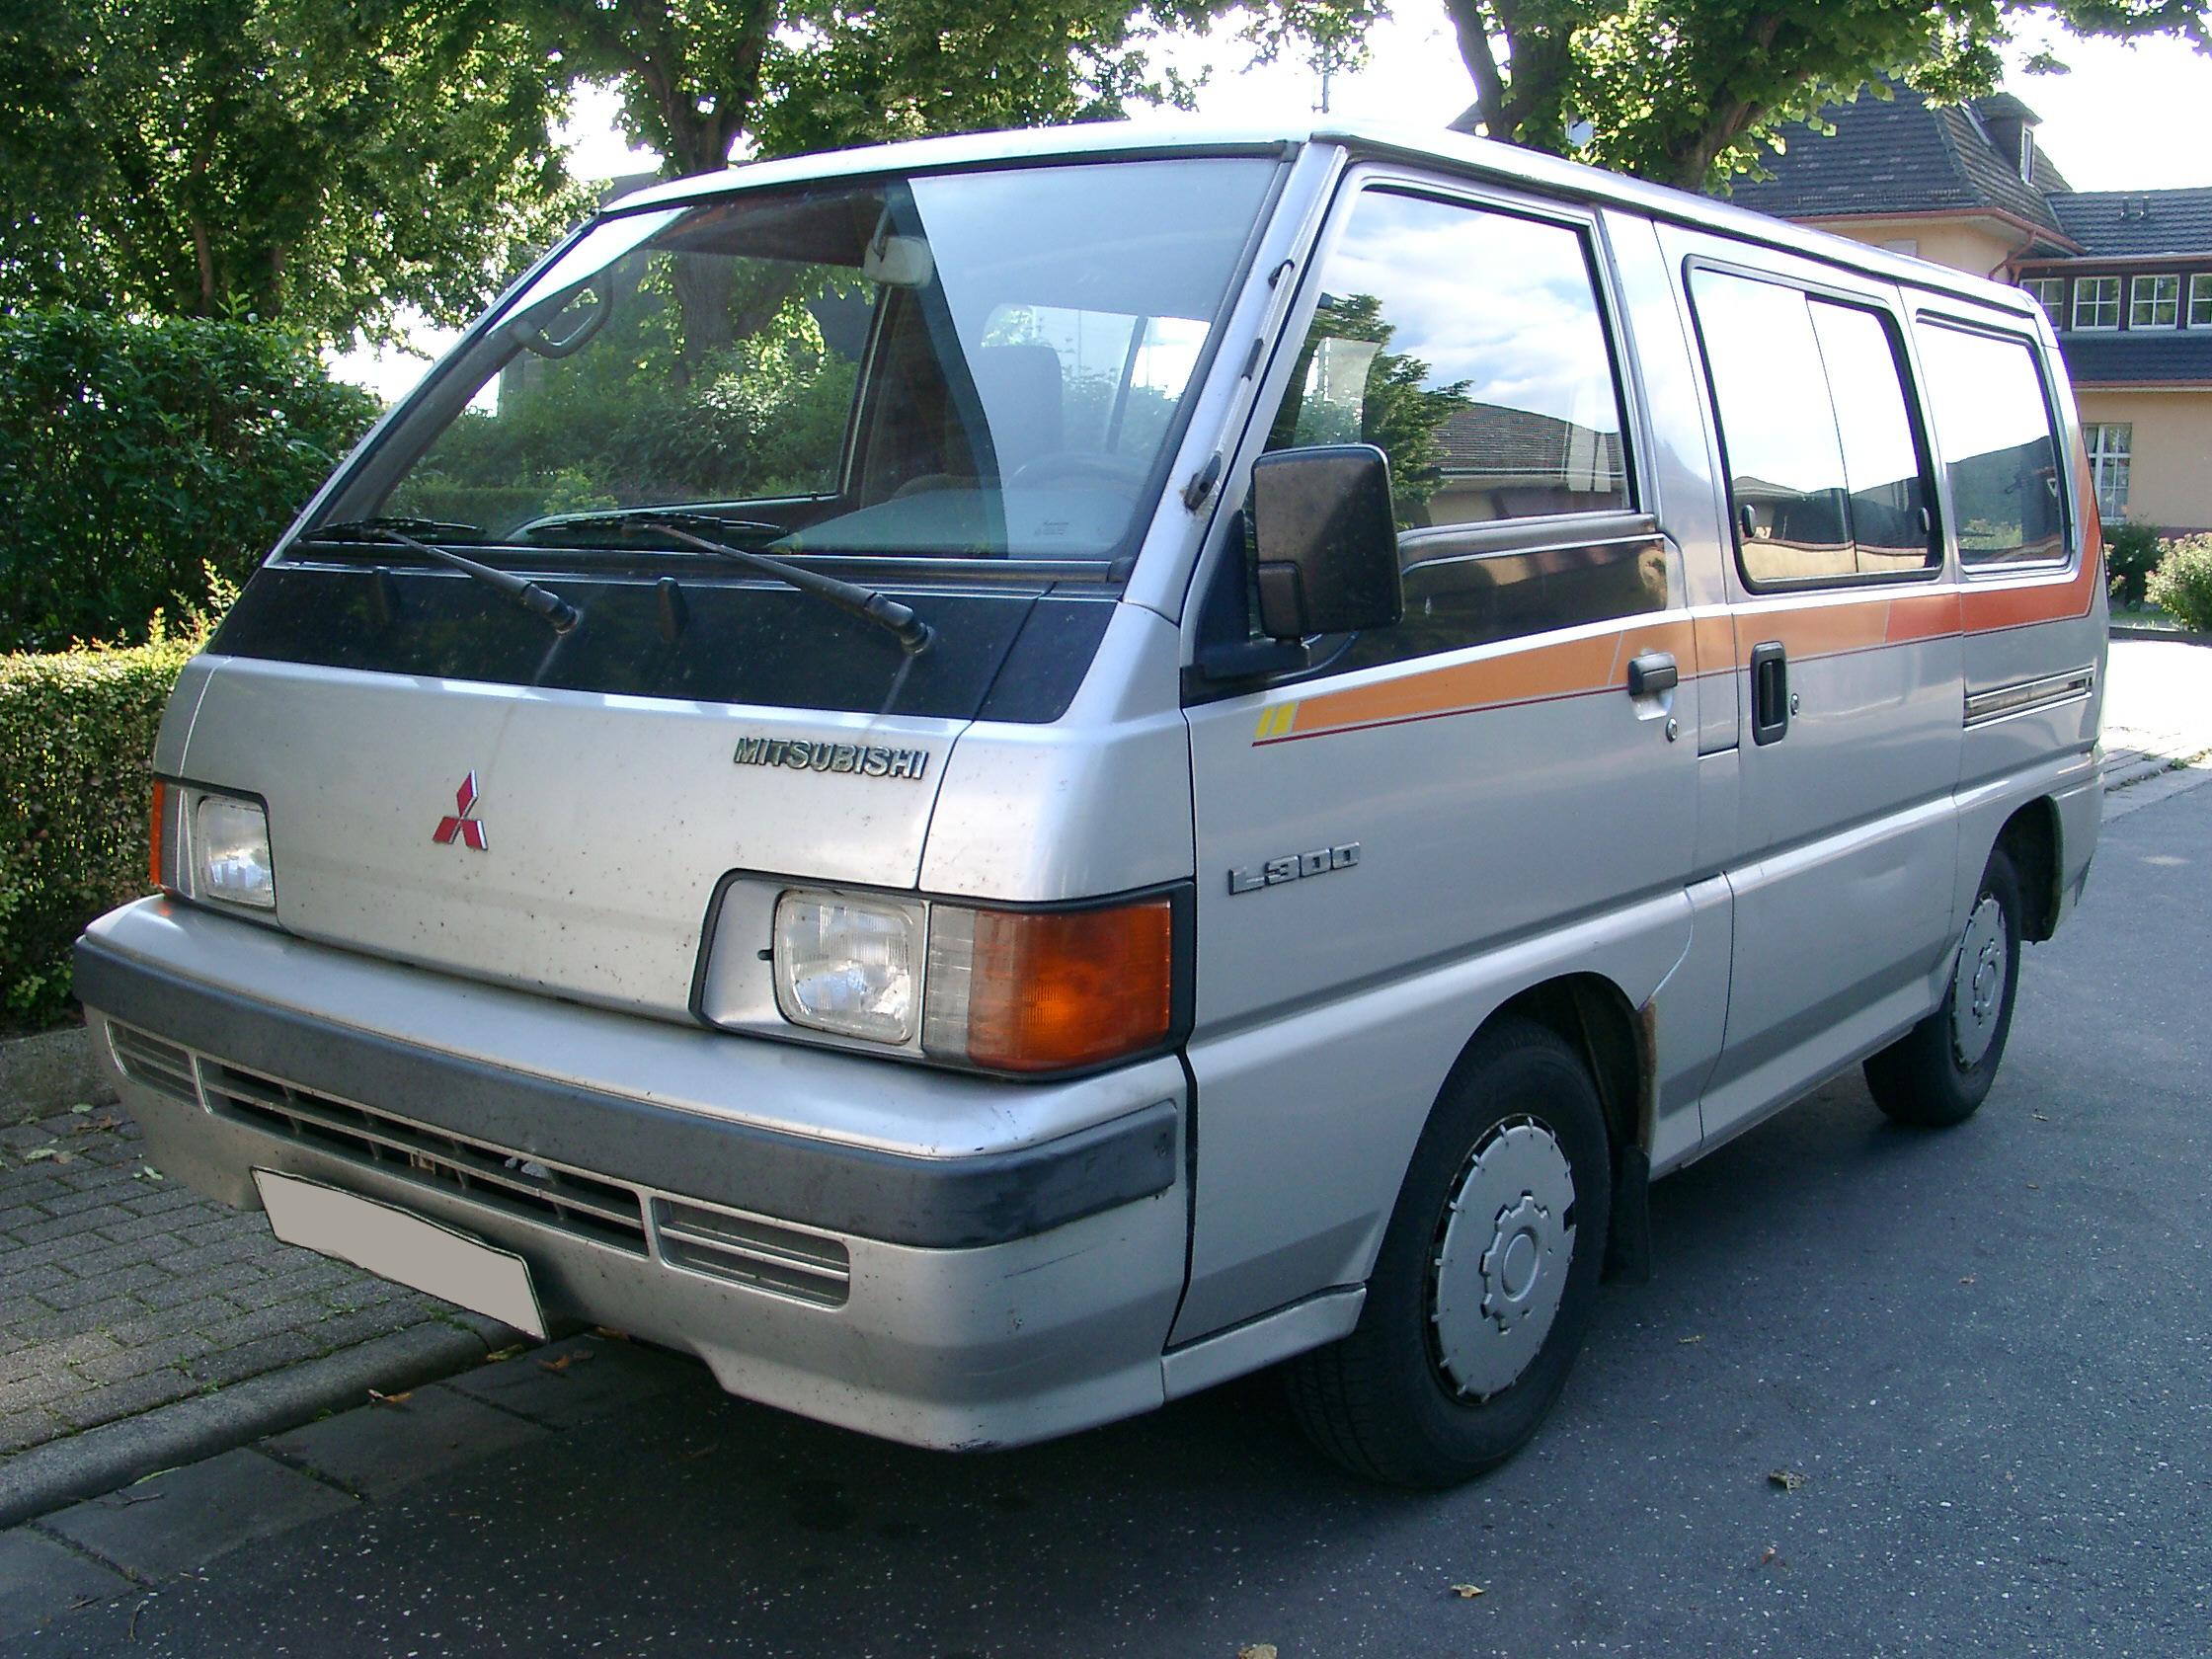 Fichier:Mitsubishi L300 Front 20070518.jpg